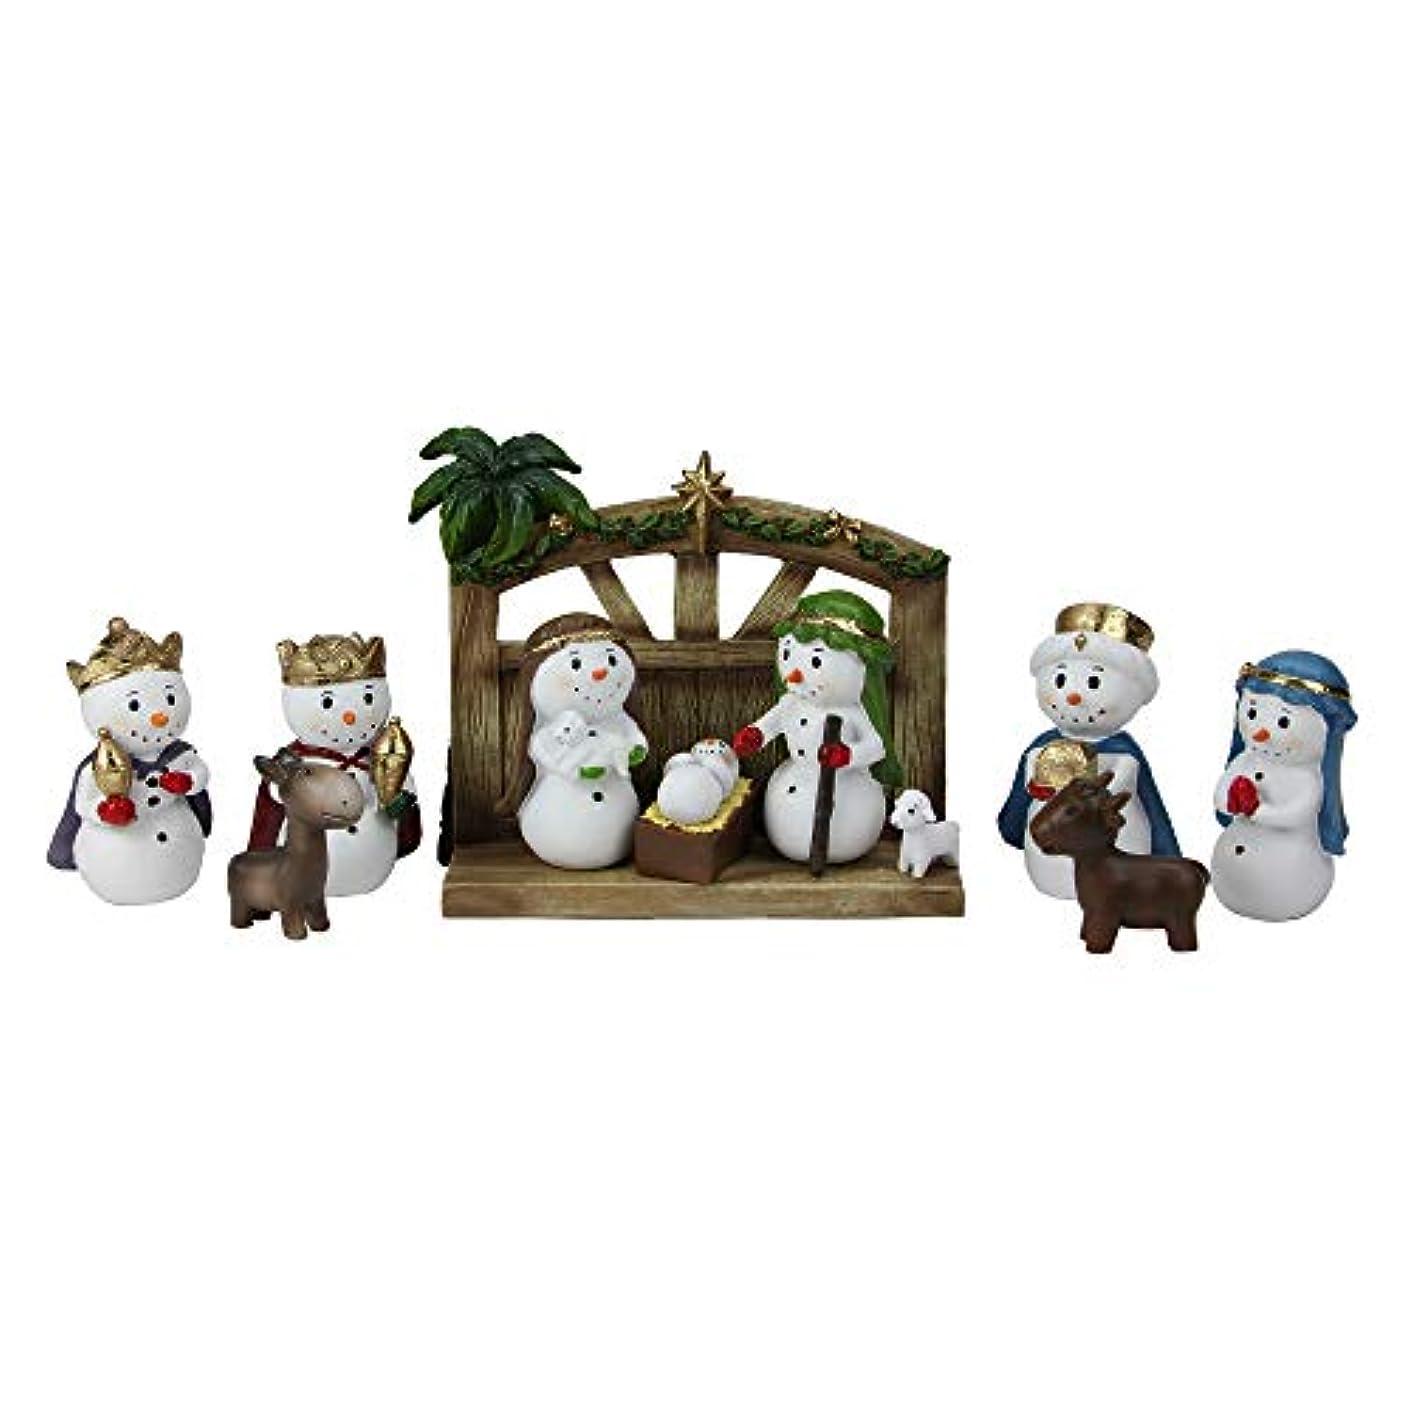 11 Piece Gold Glittered Snowman Christmas Nativity Tabletop Set 6.5